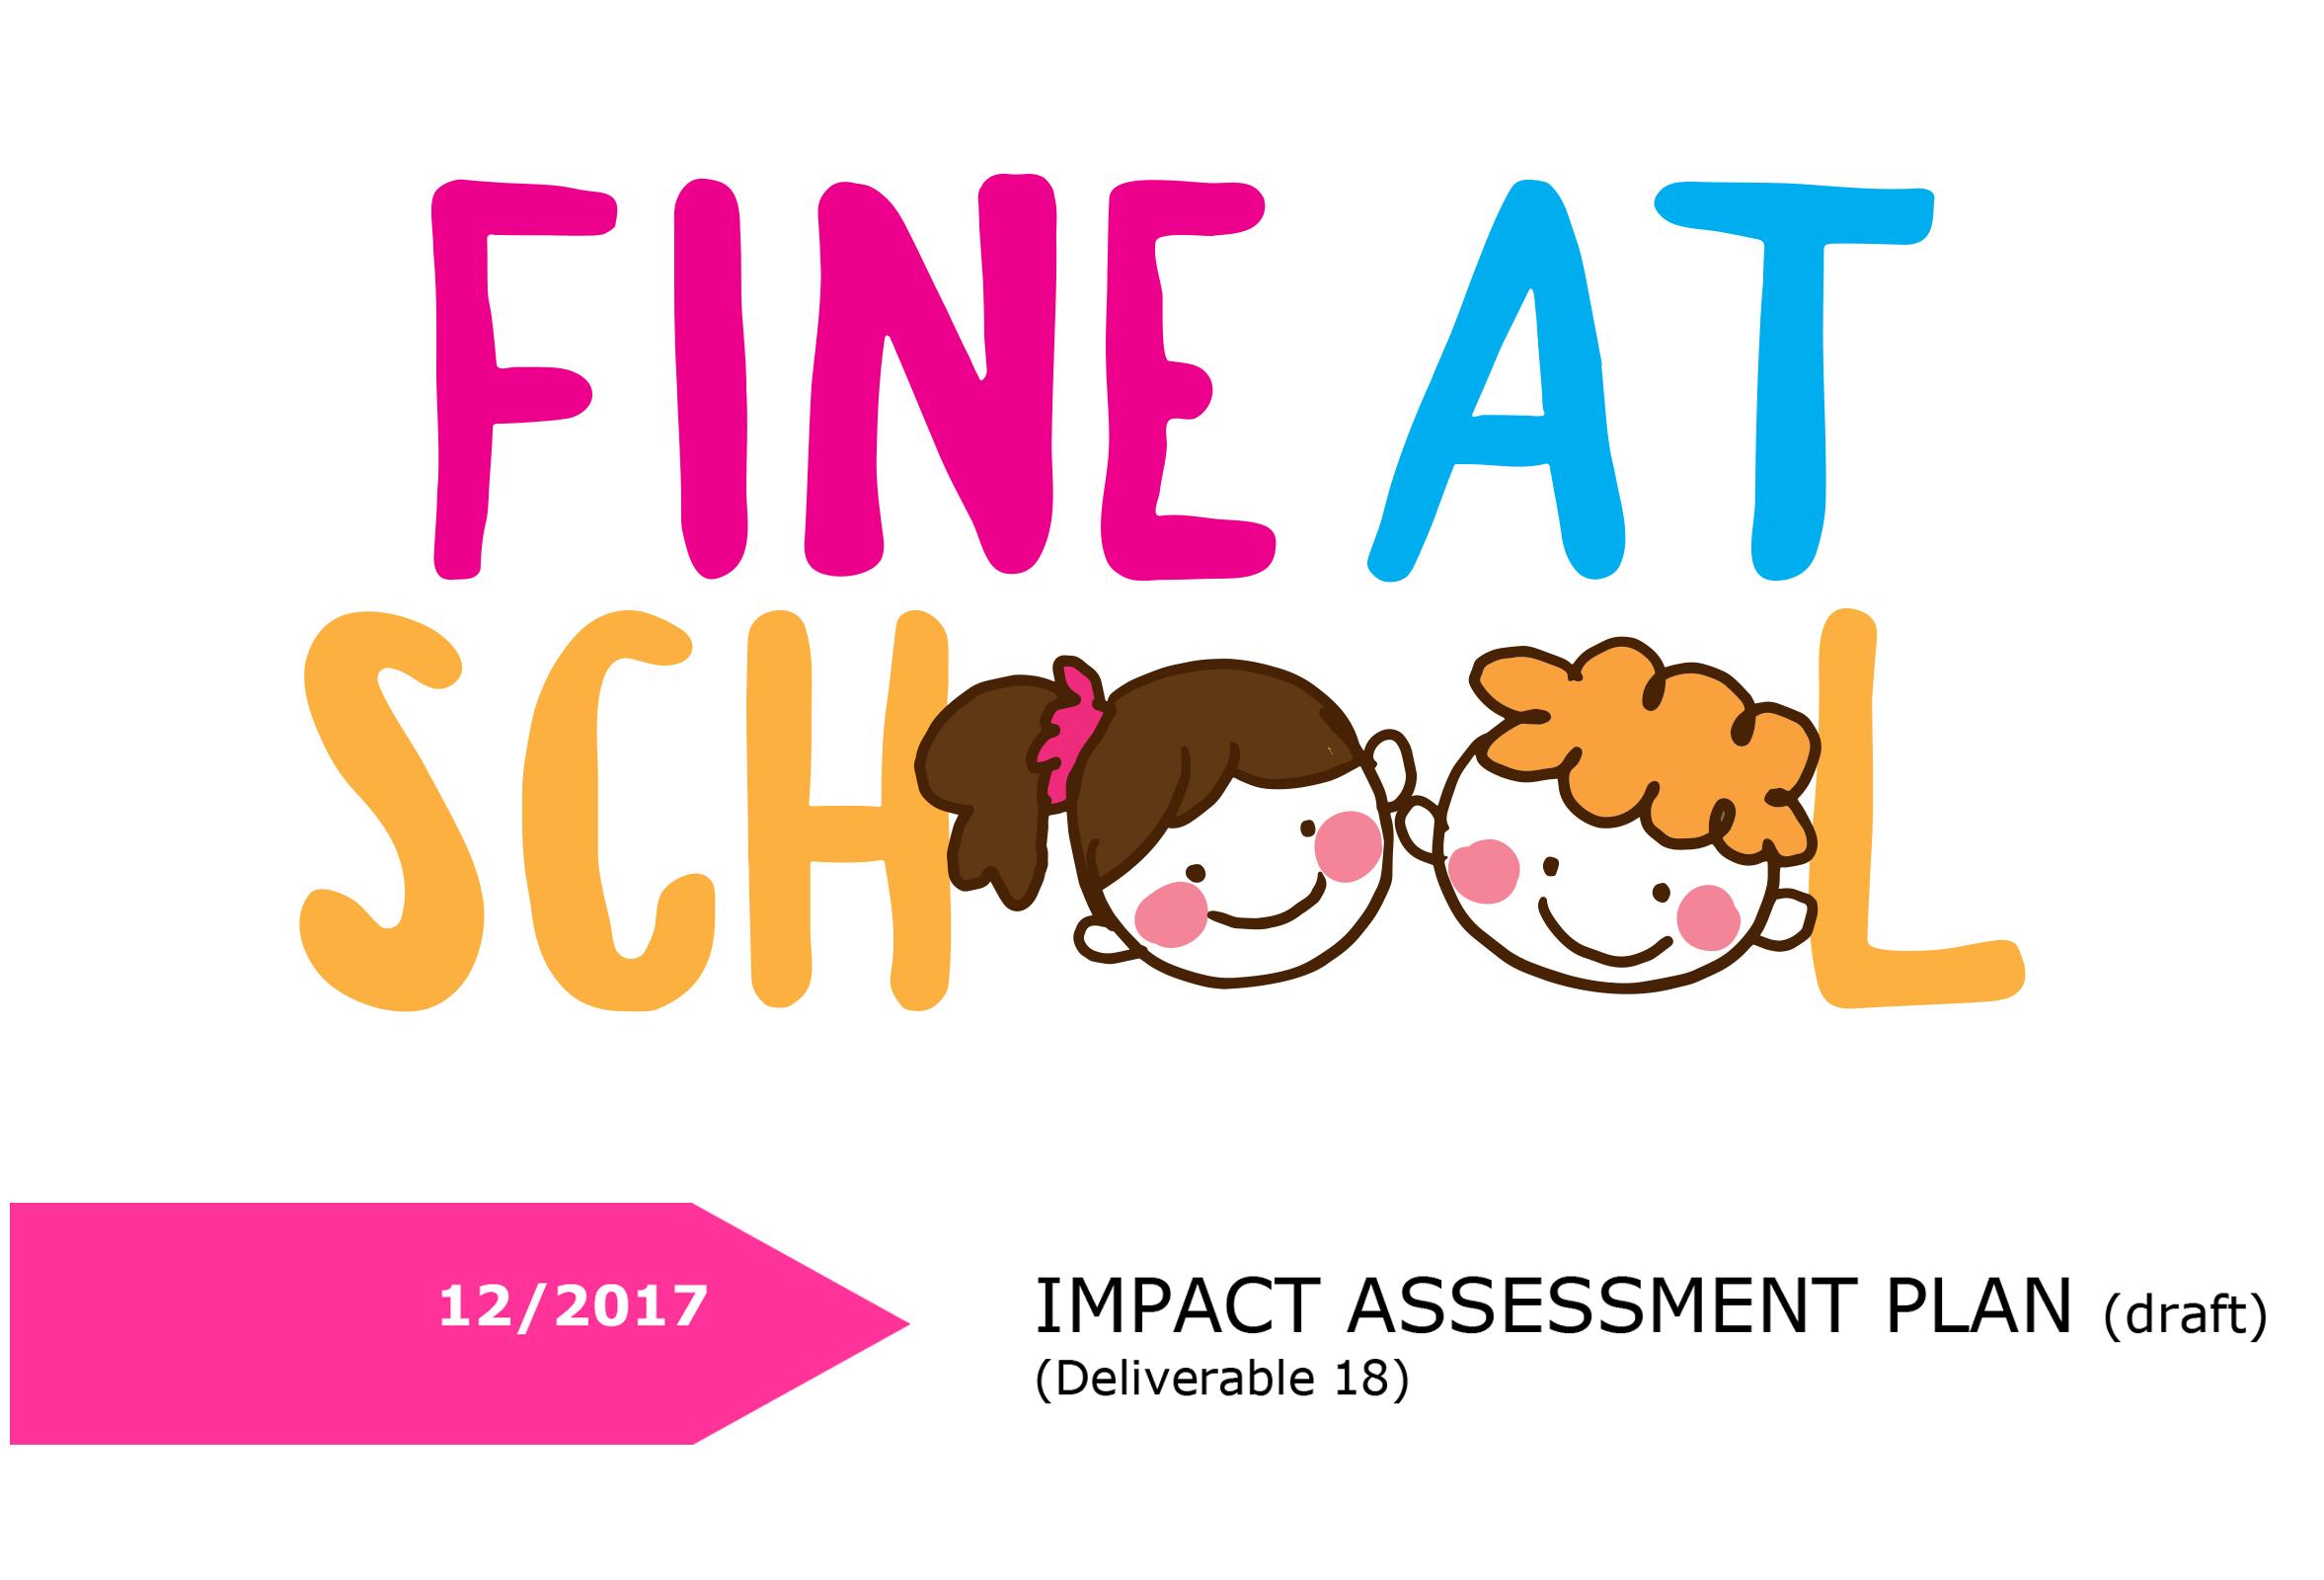 Impact-assessment-plan-first-version